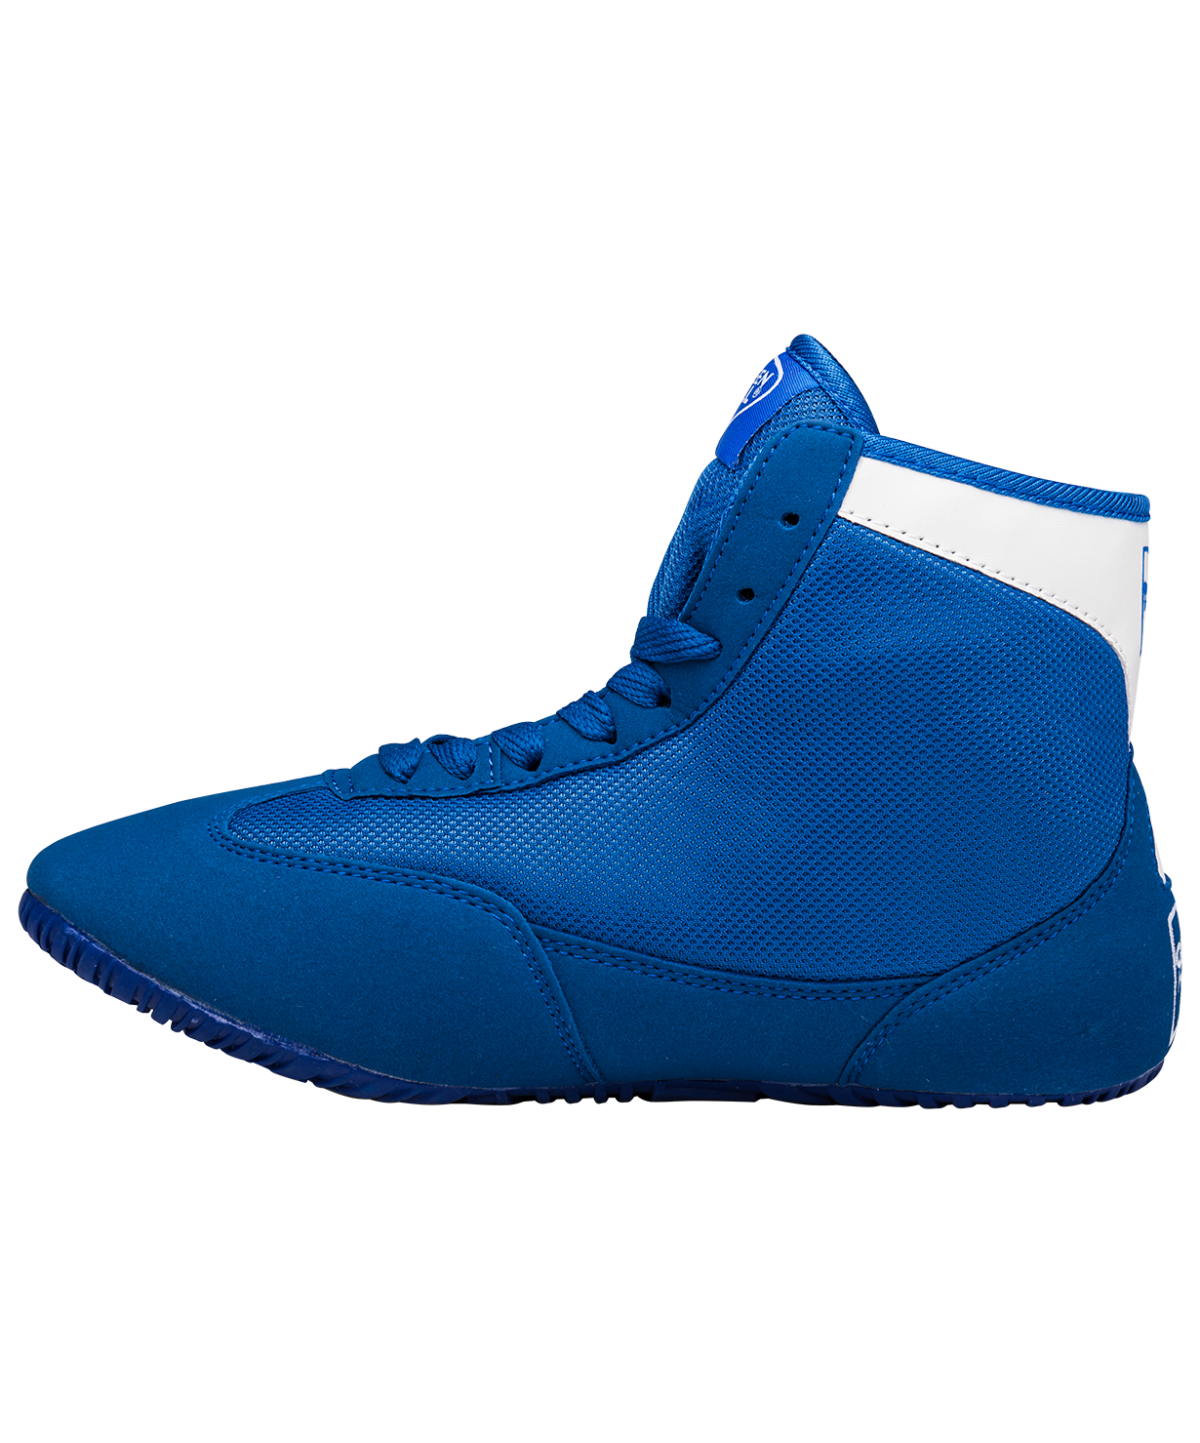 GREEN HILL Обувь для борьбы  GWB-3052/GWB-3055: синий/белый - 4